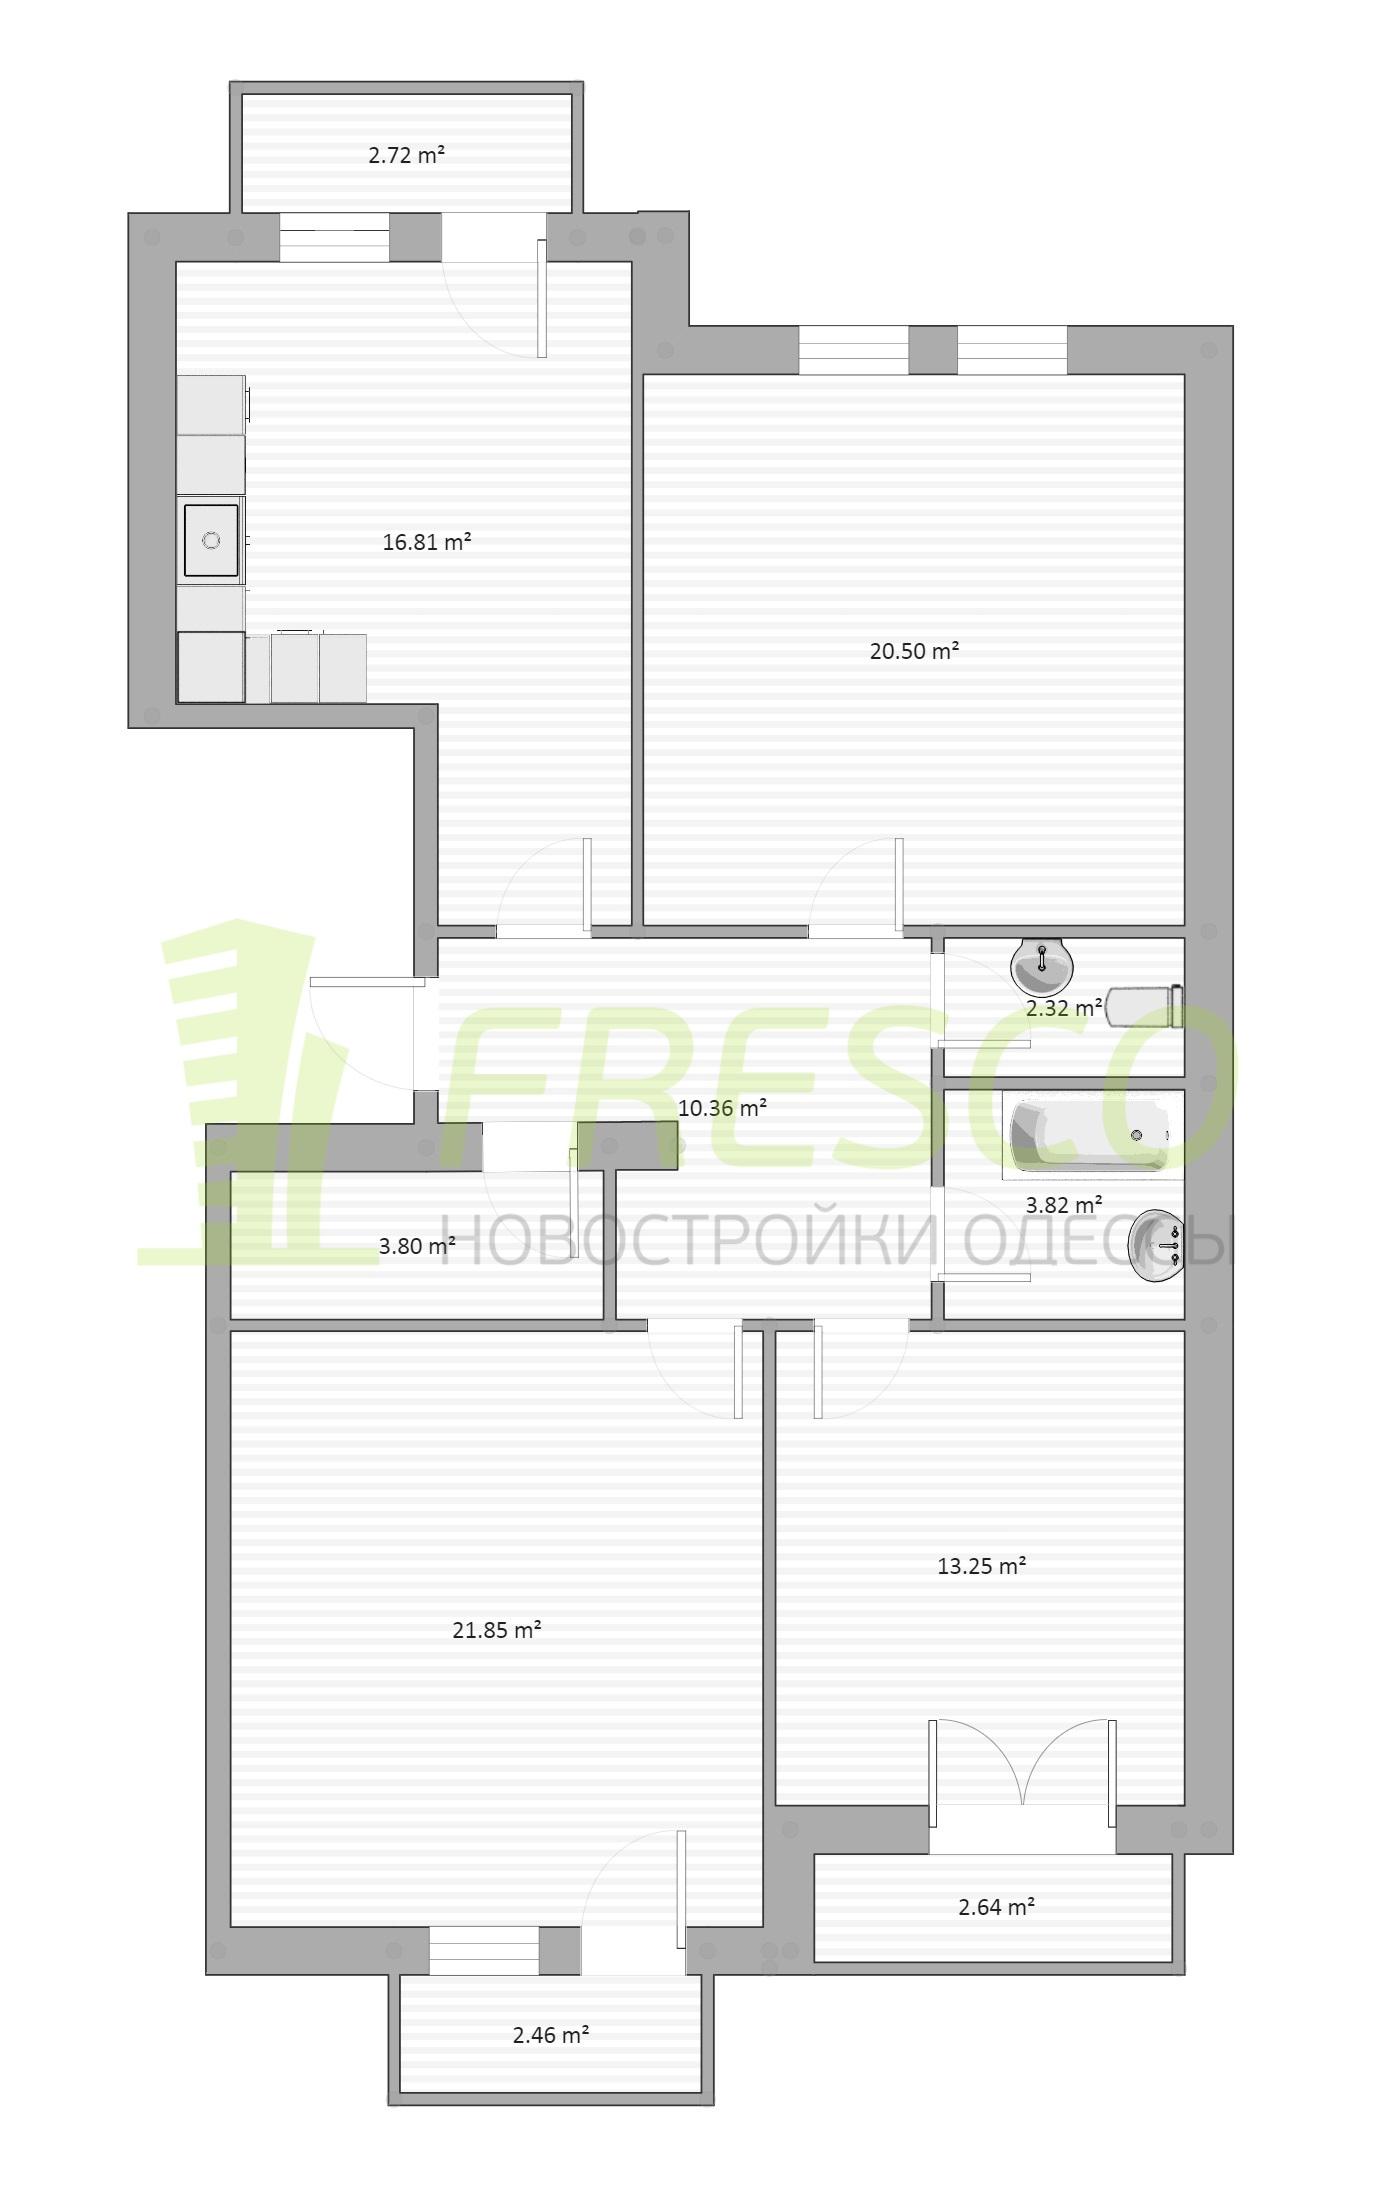 Трехкомнатная - ЖК Chelsea club house (Клубный дом Челси)ПроданаПлощадь:96,7m²